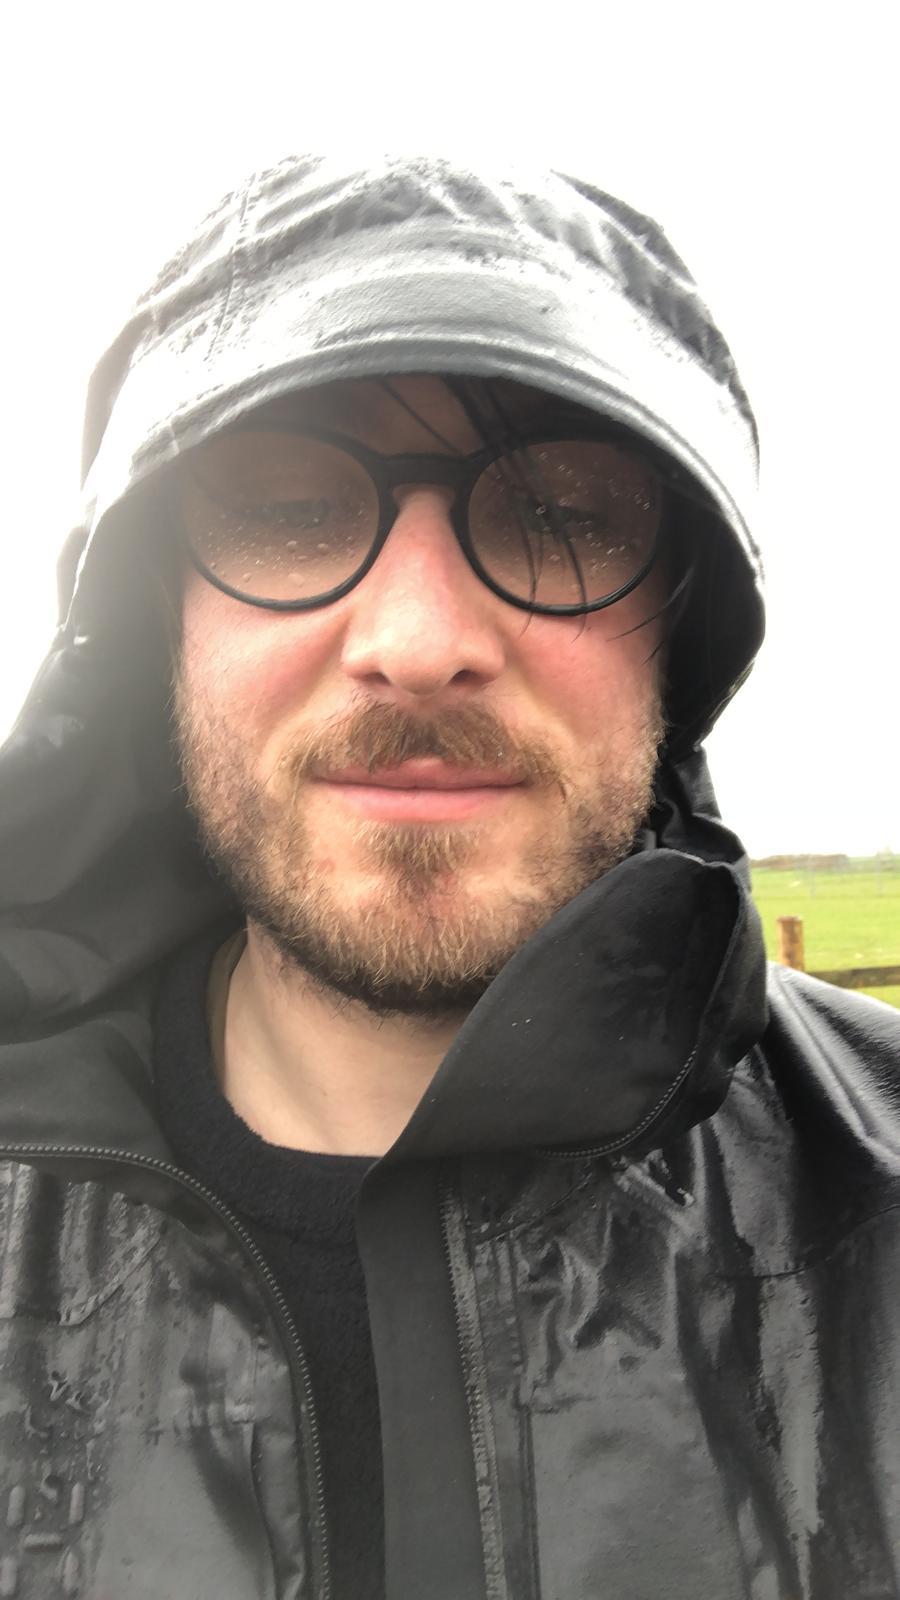 Image of Luke at Cracksone Barns